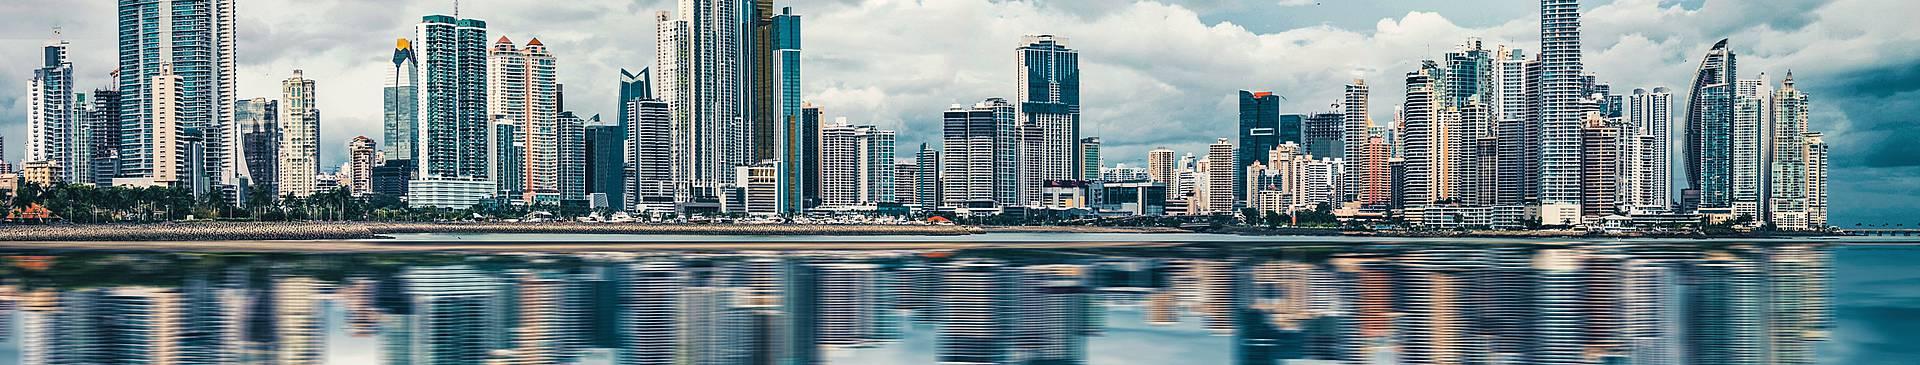 Cities in Panama